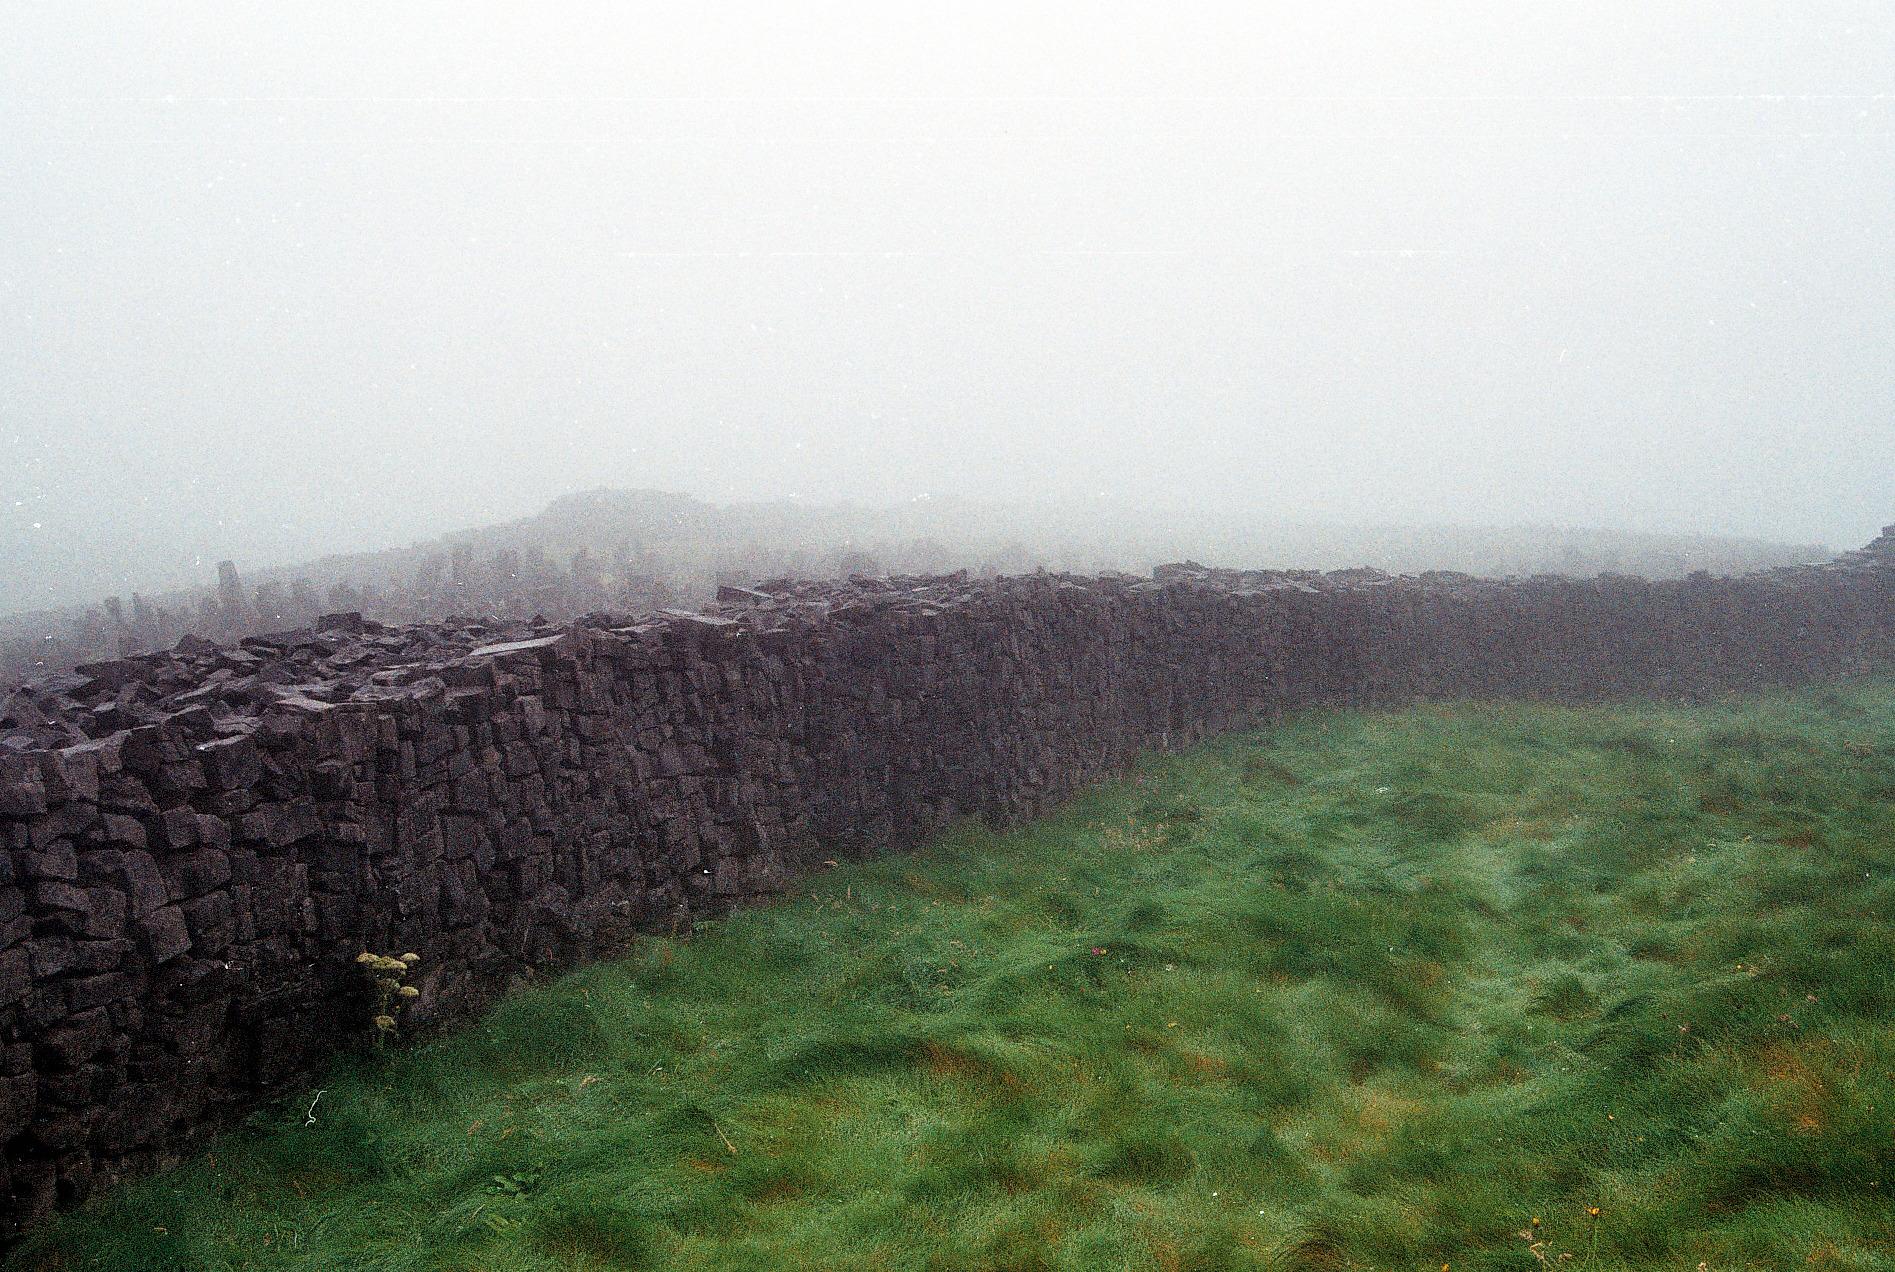 Aran Islands, Ireland. 35mm film, 2012.